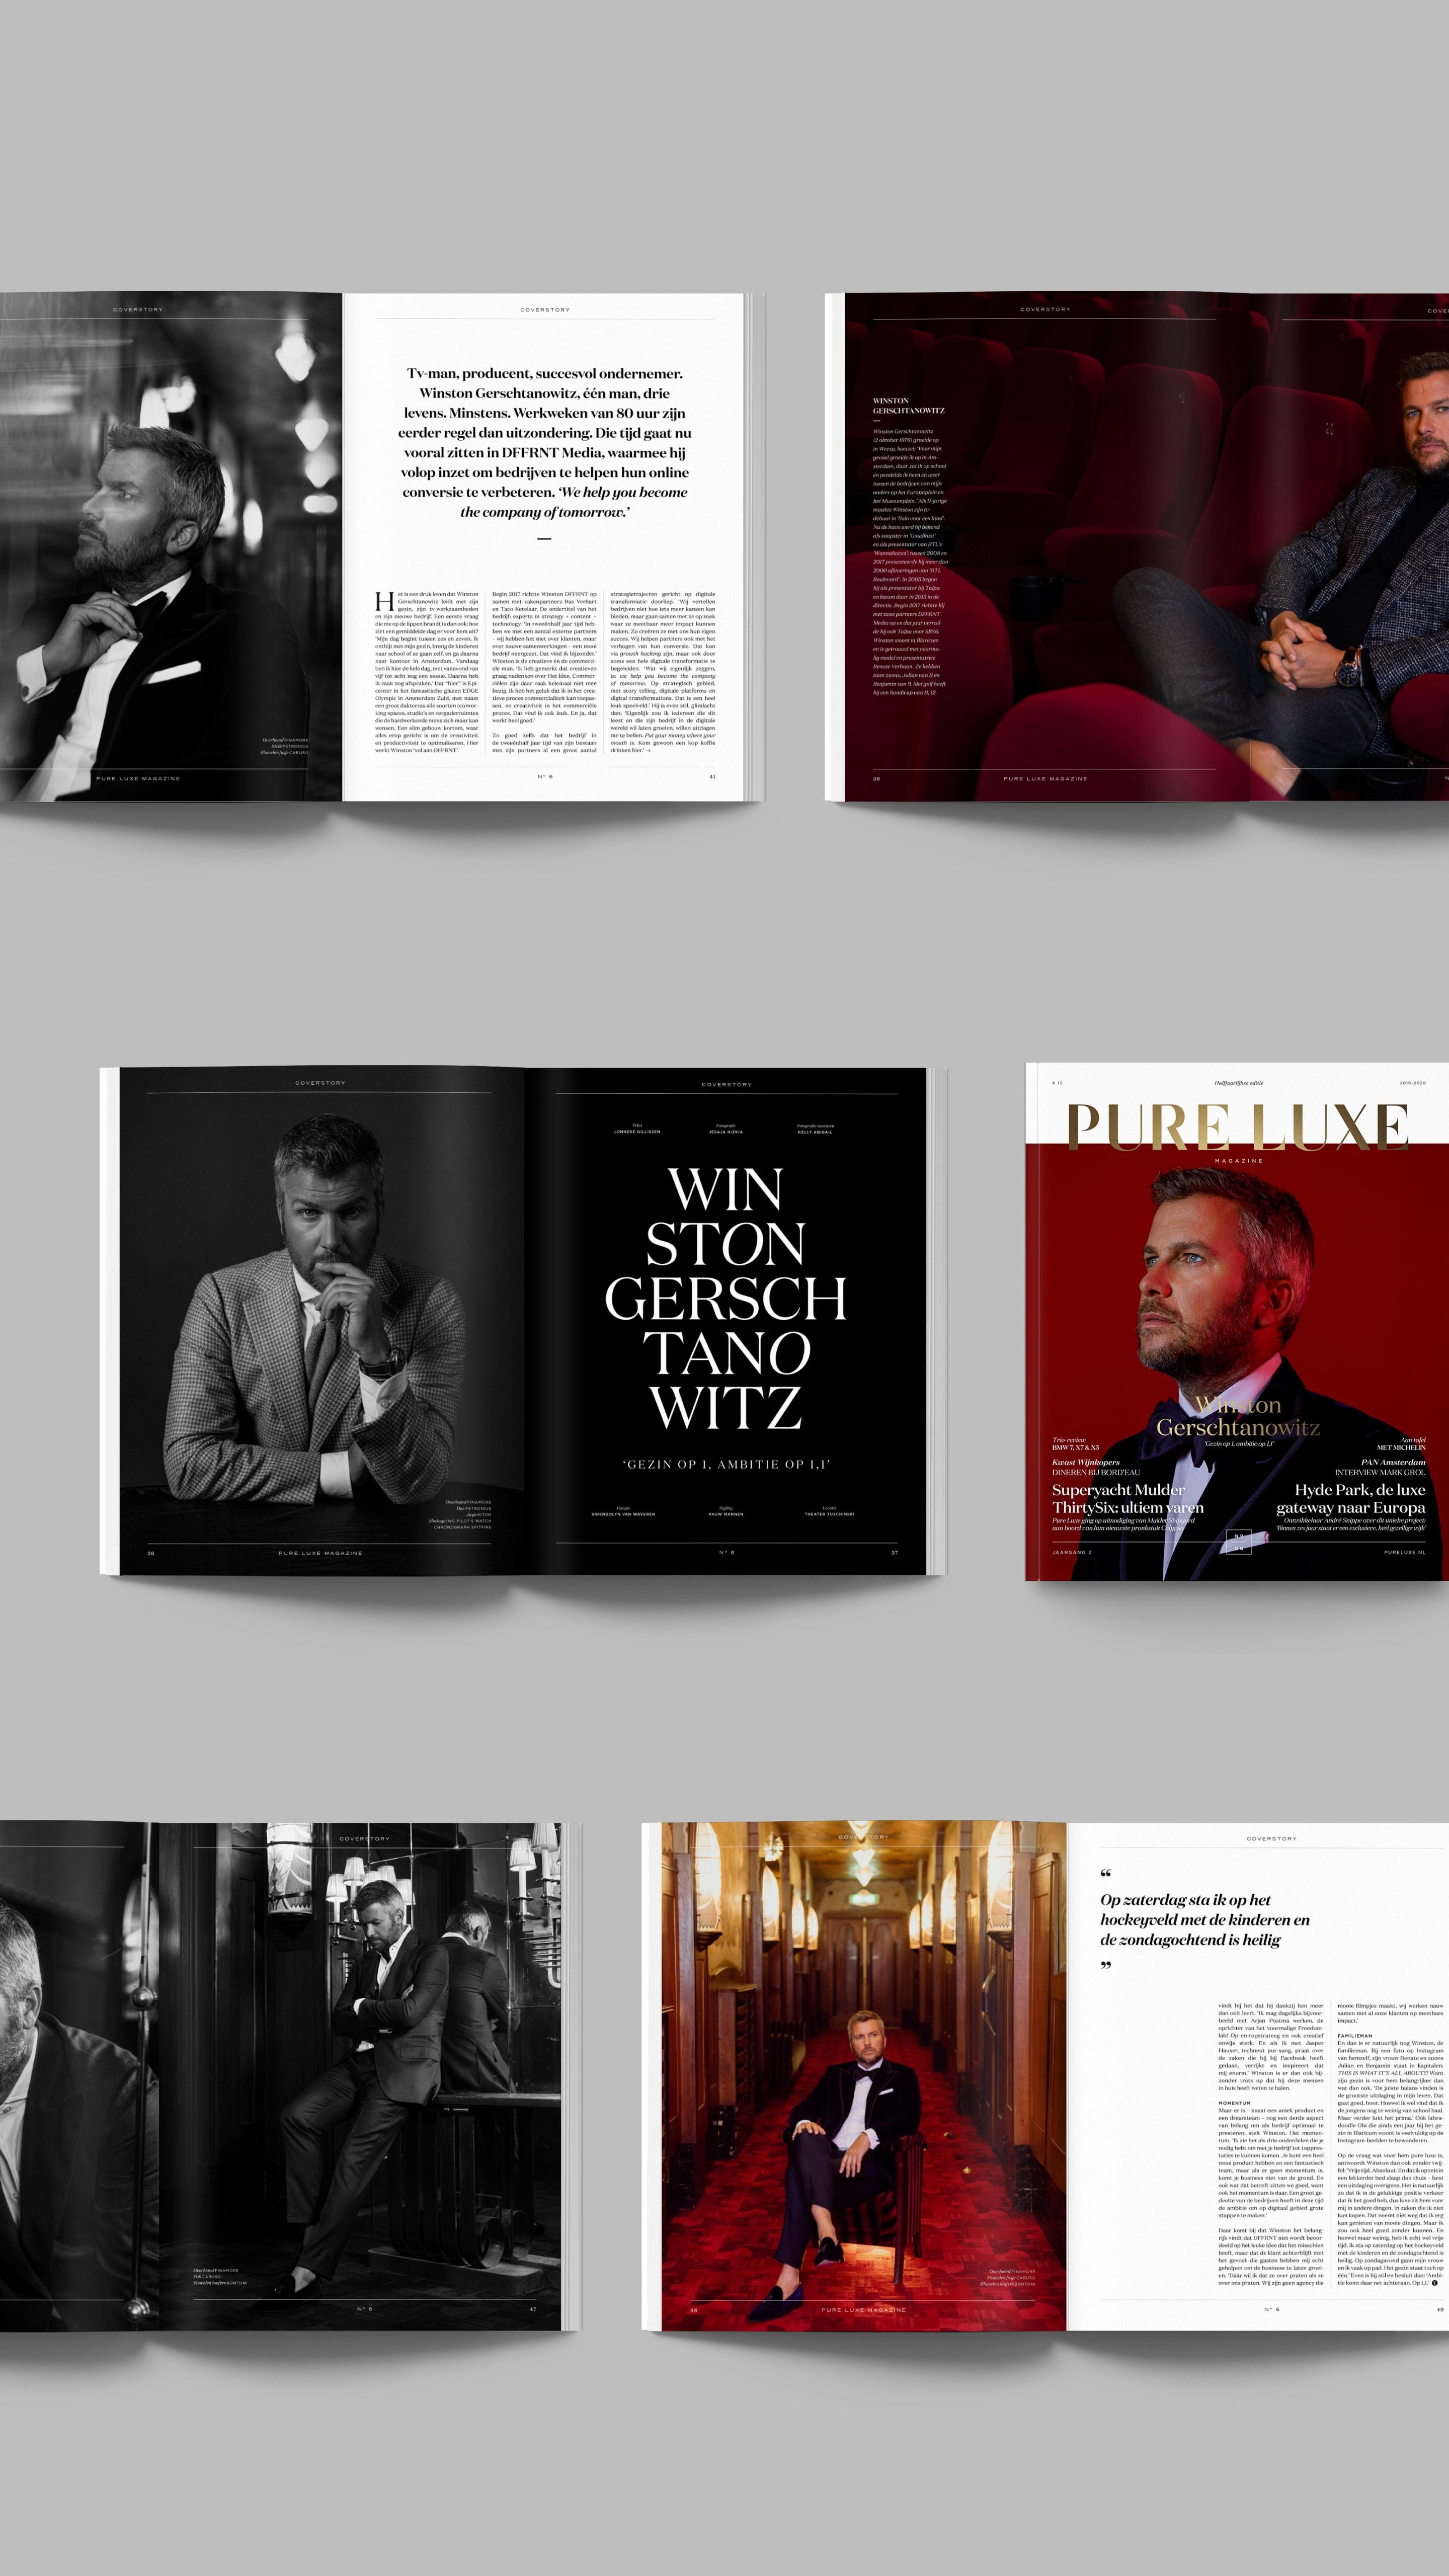 PL-Print-Magazine-2-2